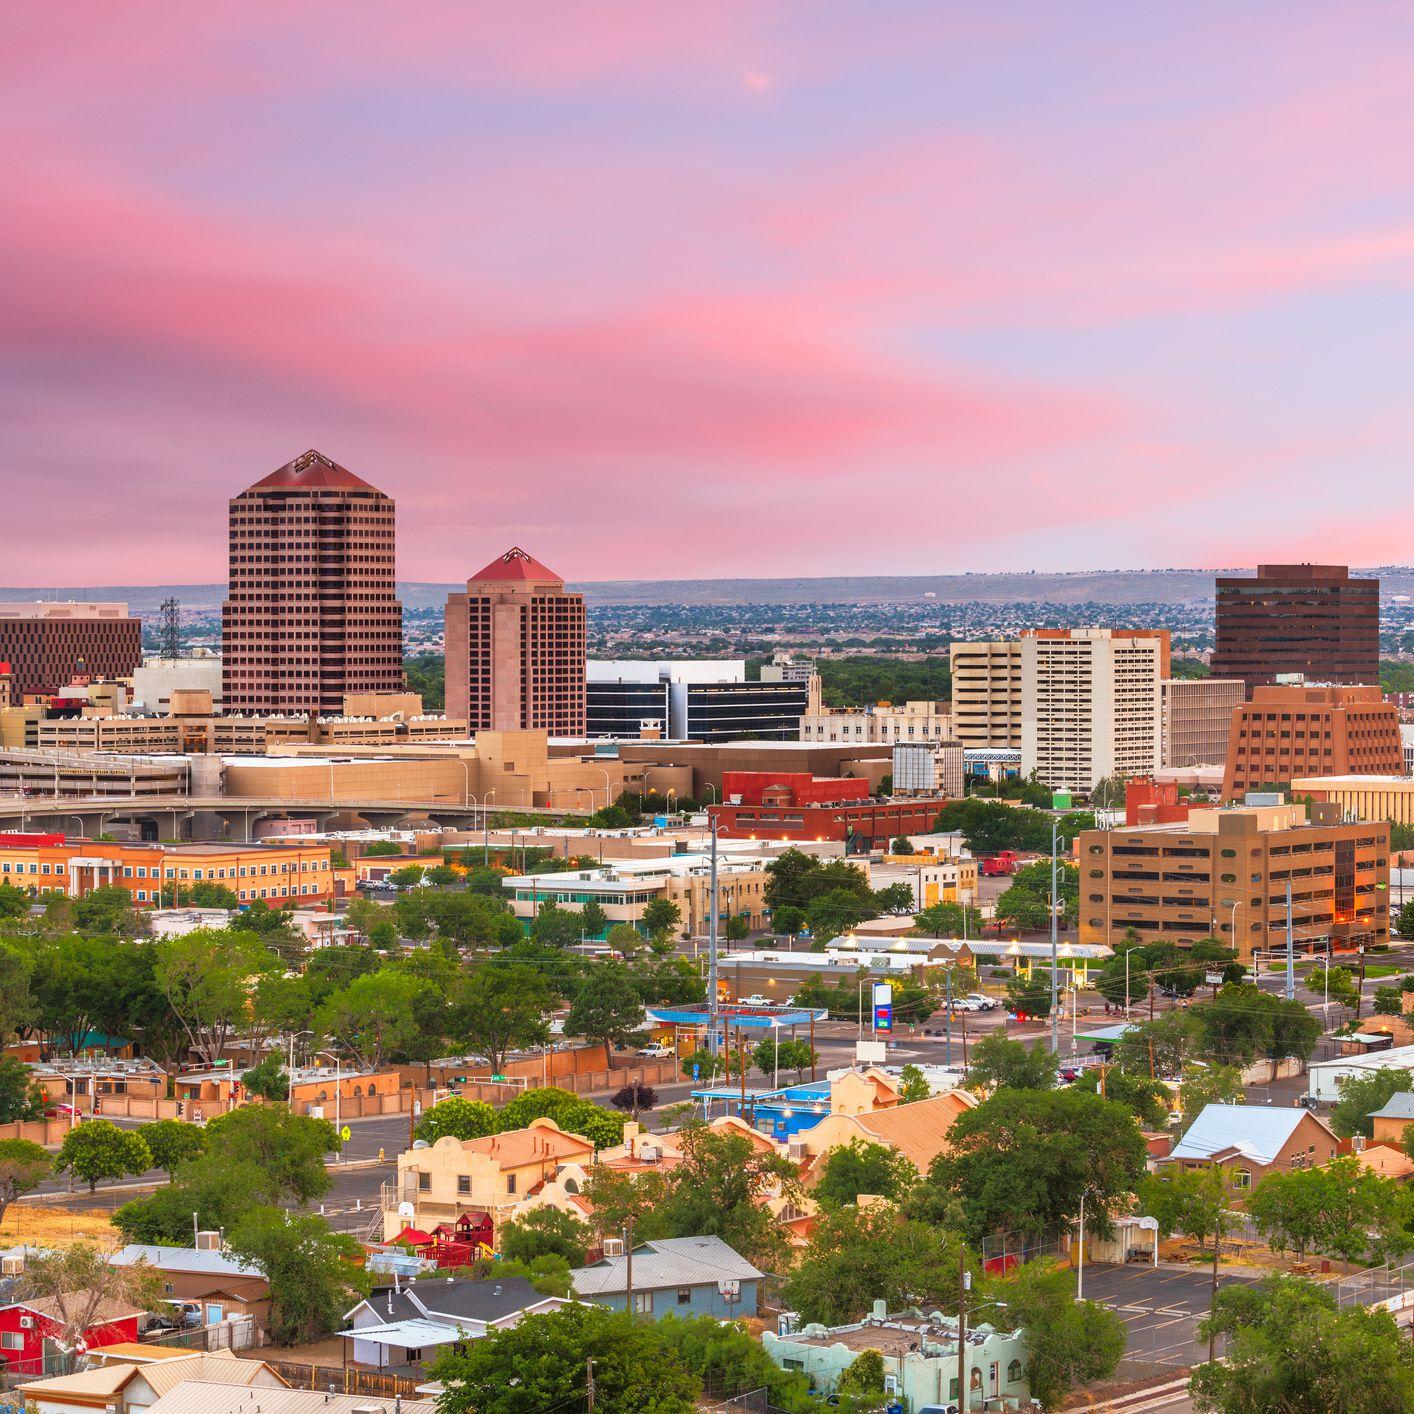 The Top 10 Neighborhoods to Explore in Albuquerque